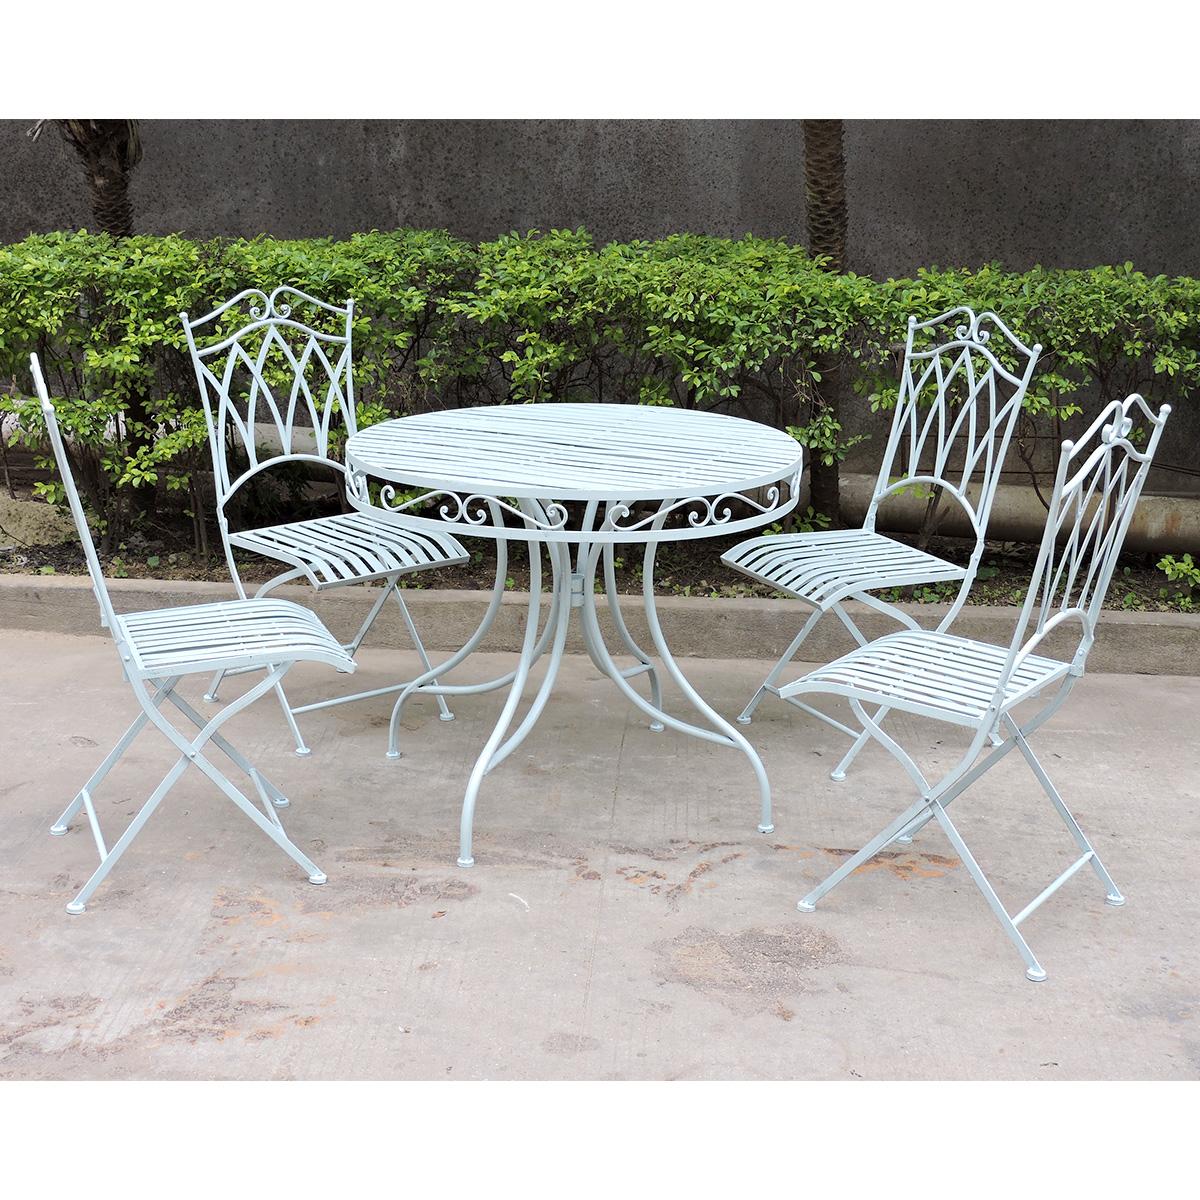 Charles Bentley Garden 5 Piece Wrought Iron furniture Set - In Green ...